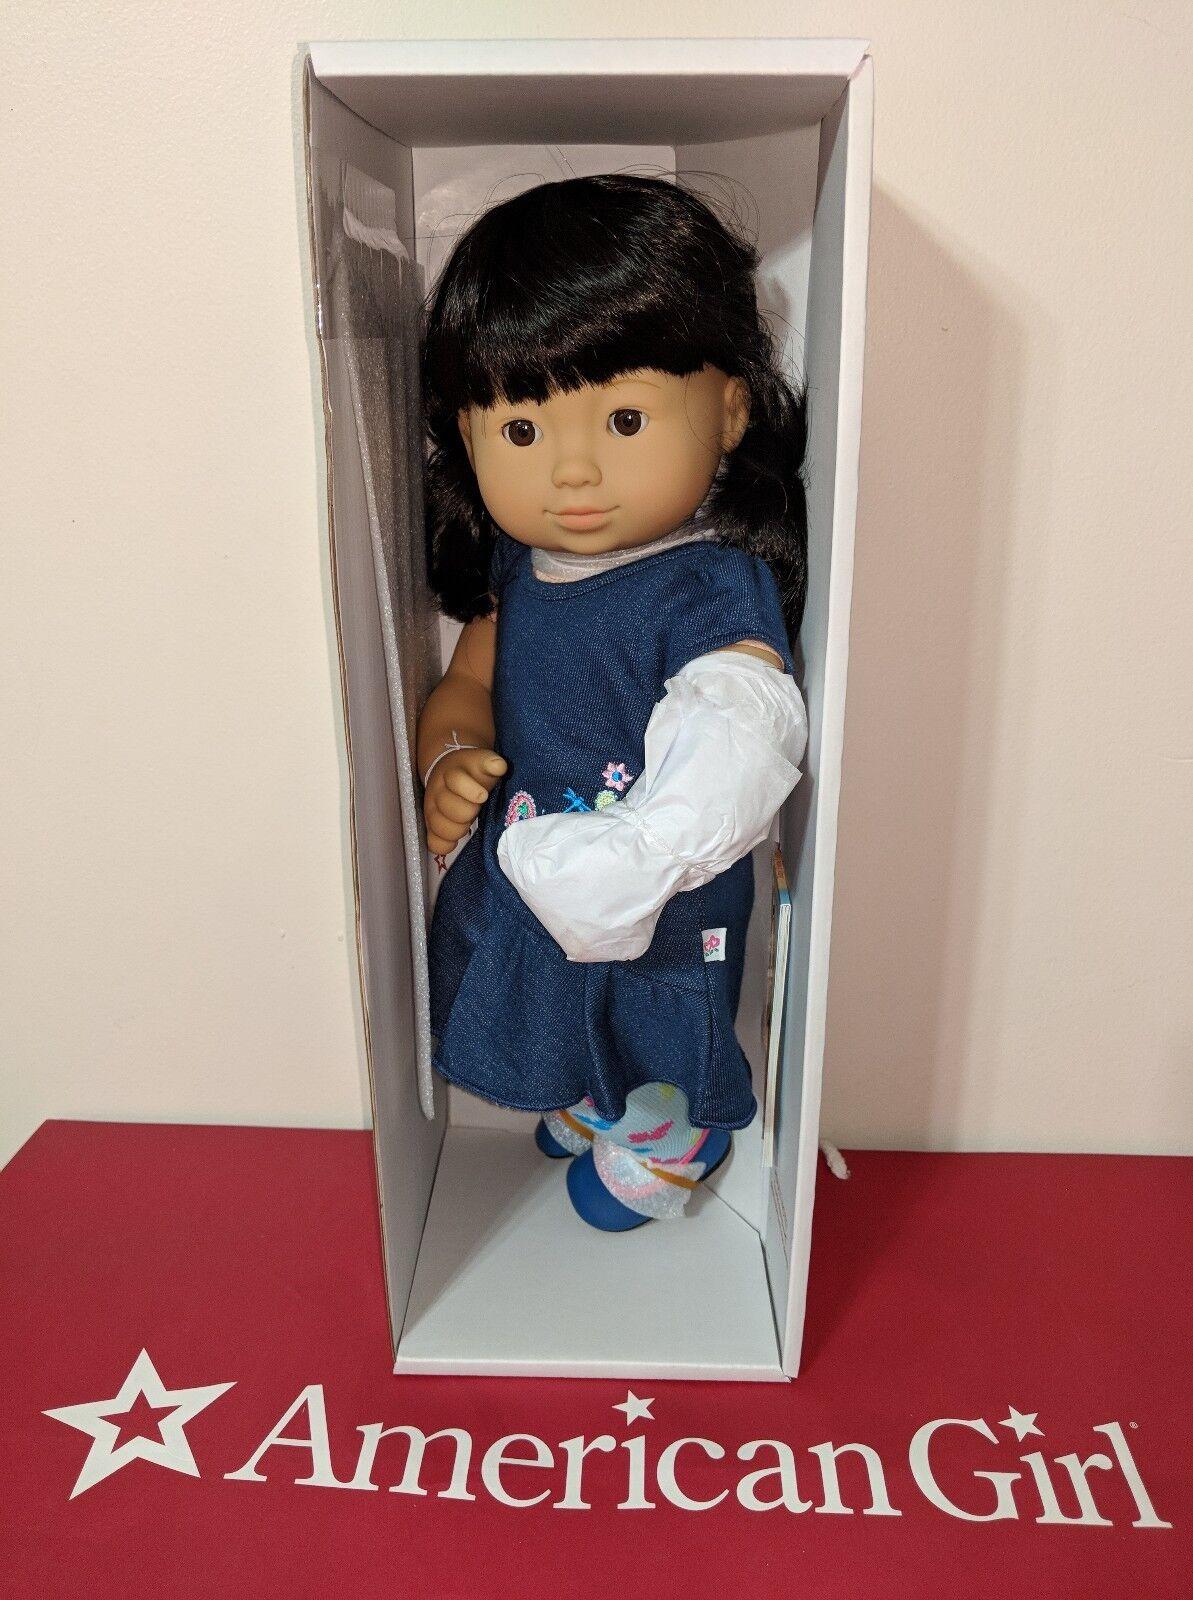 American Girl Bitty Twins 4G schwarz HAIR braun EYES Asian single Doll NEW